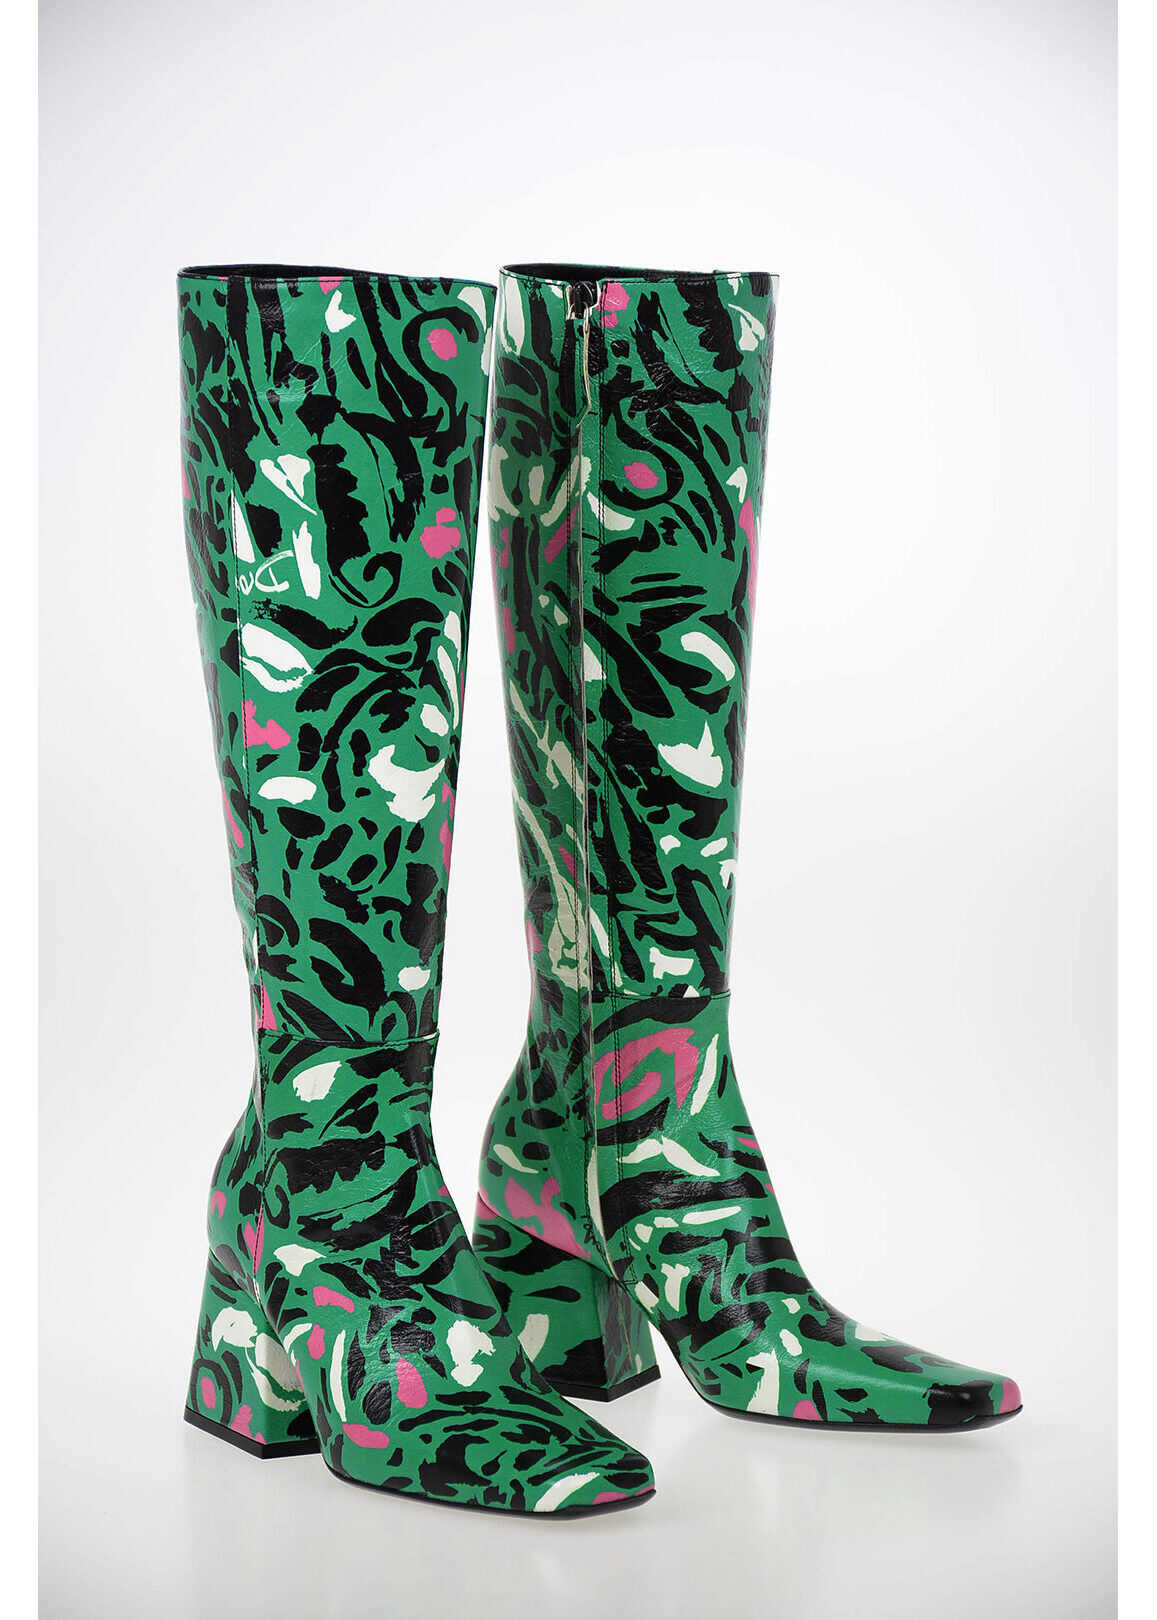 DROME Printed Leather Boots with Square Toe 8cm MULTICOLOR imagine b-mall.ro